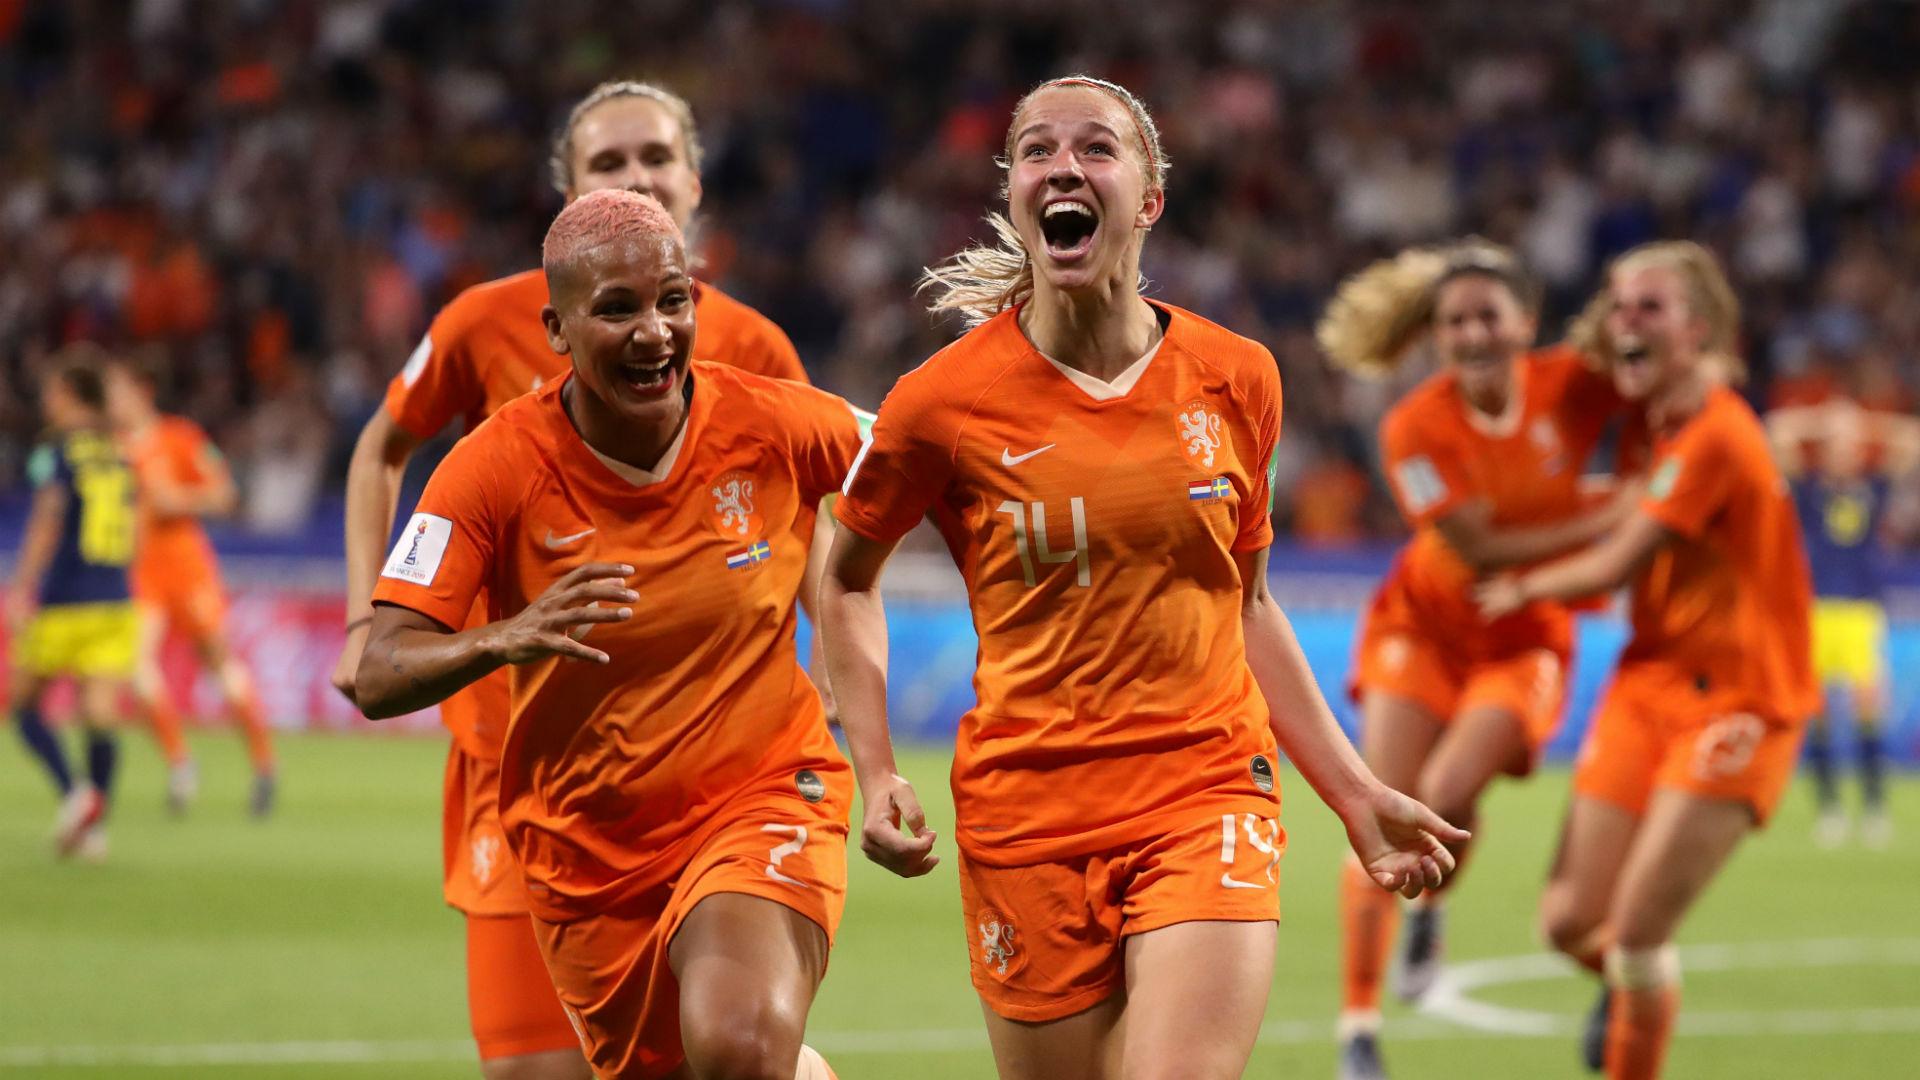 Jackie Groenen Netherlands Sweden Women's World Cup 2019